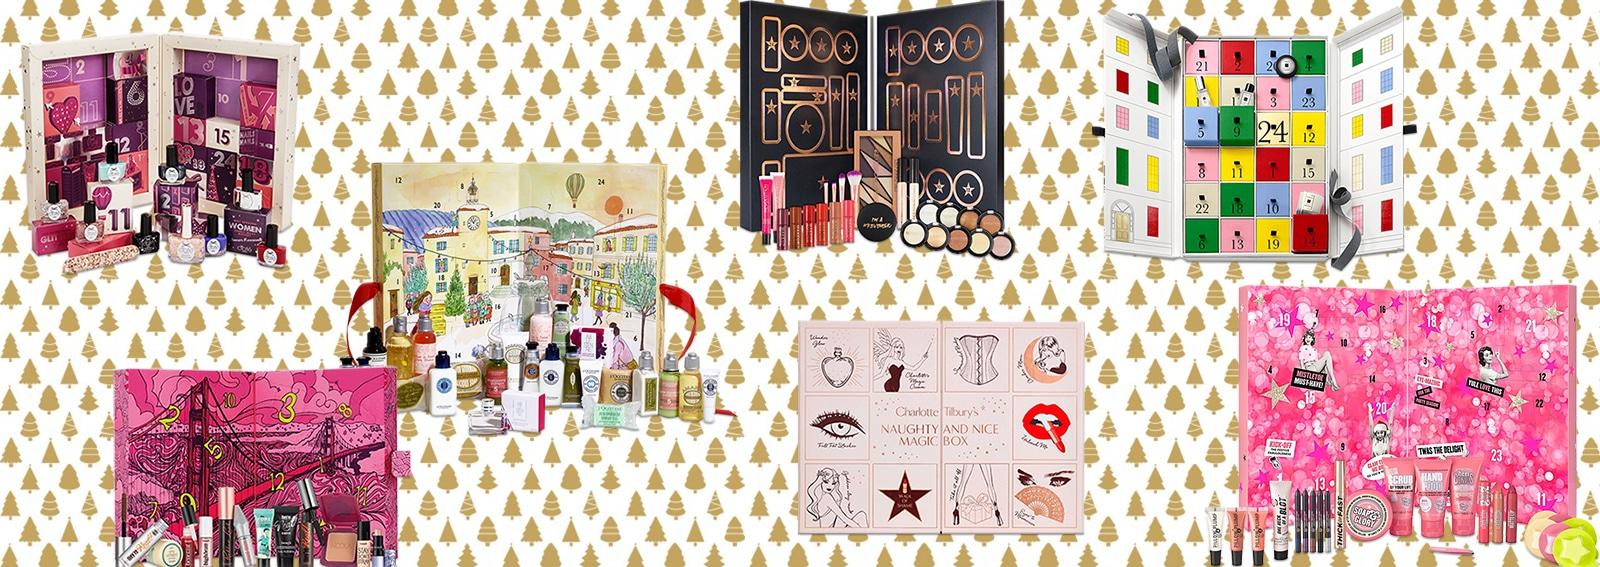 calendario dell'avvento beauty 2017 make up skin care collage_desktop